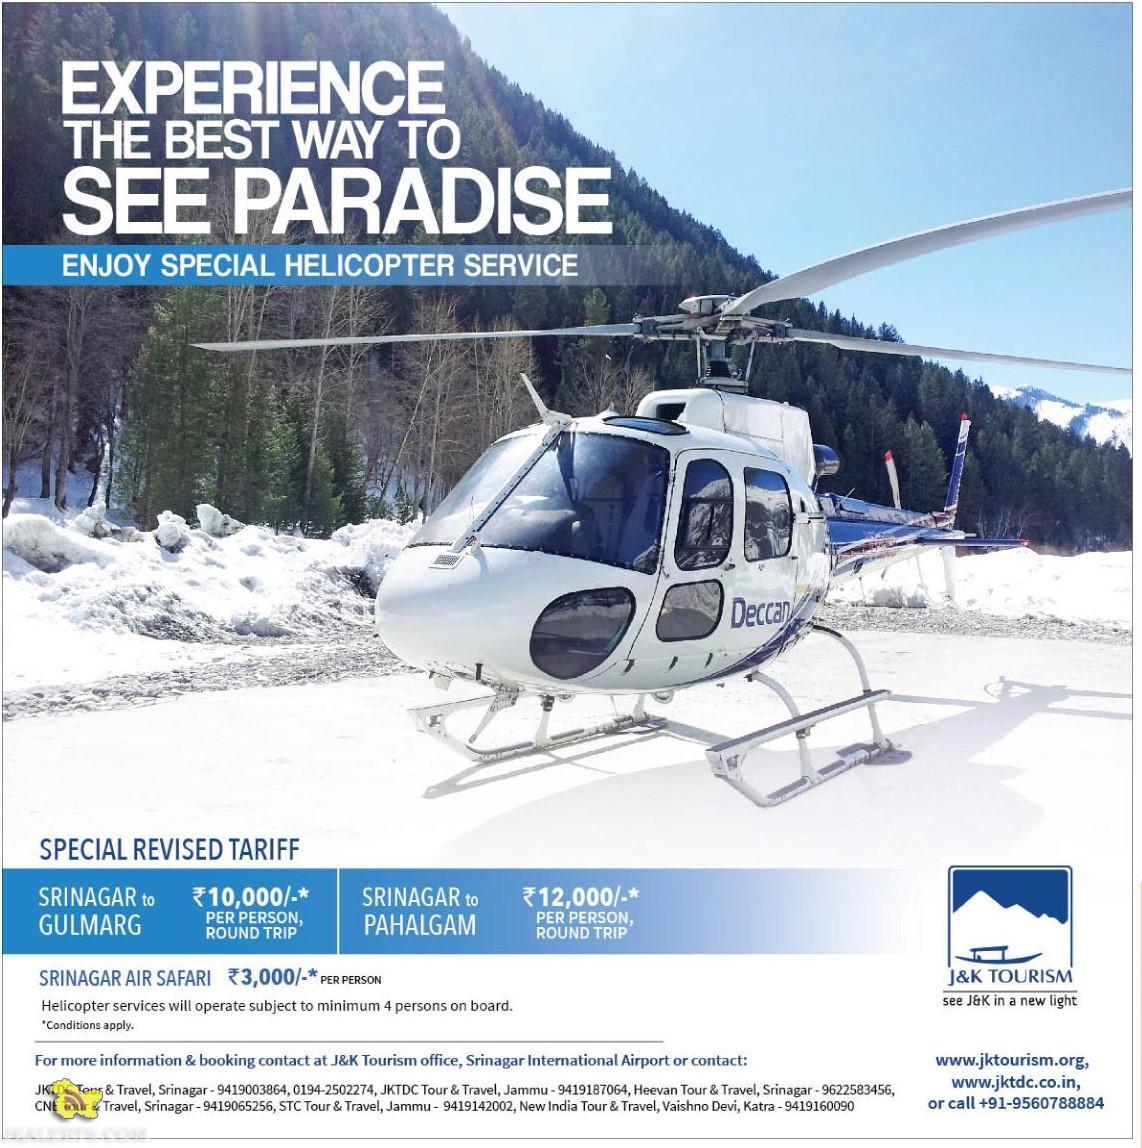 J&K tourism Special Helicopter service Srinagar Gulmarg Pahalgam